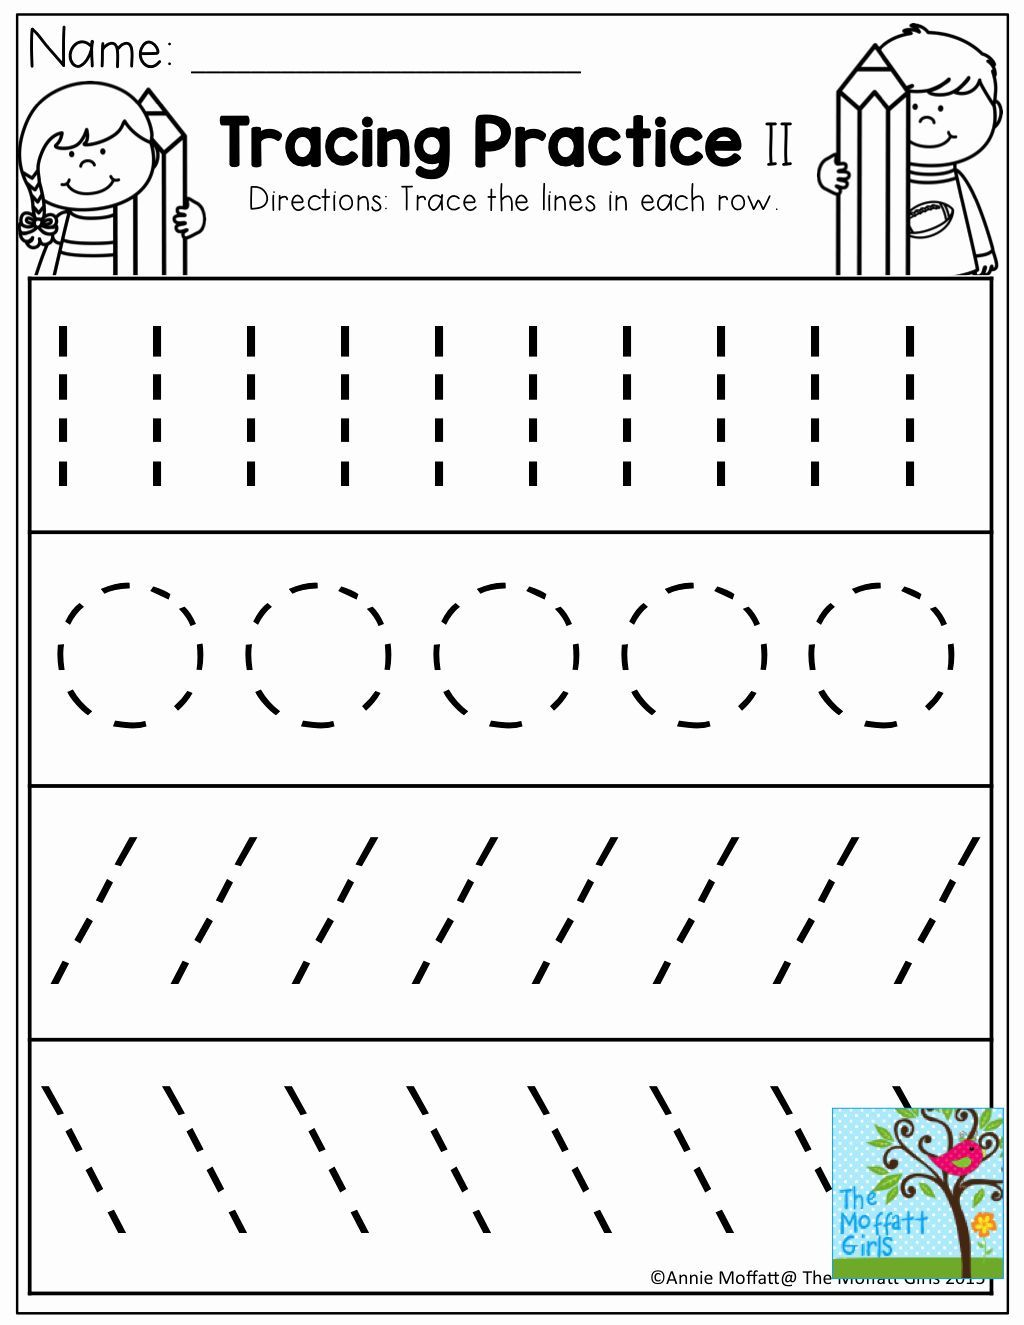 Alphabet Coloring Worksheets For 3 Year Olds New Tracing Practice Tons Of Printable For Tracing Worksheets Okul Oncesi Calisma Cizelgeleri Harfleri Ogreniyorum